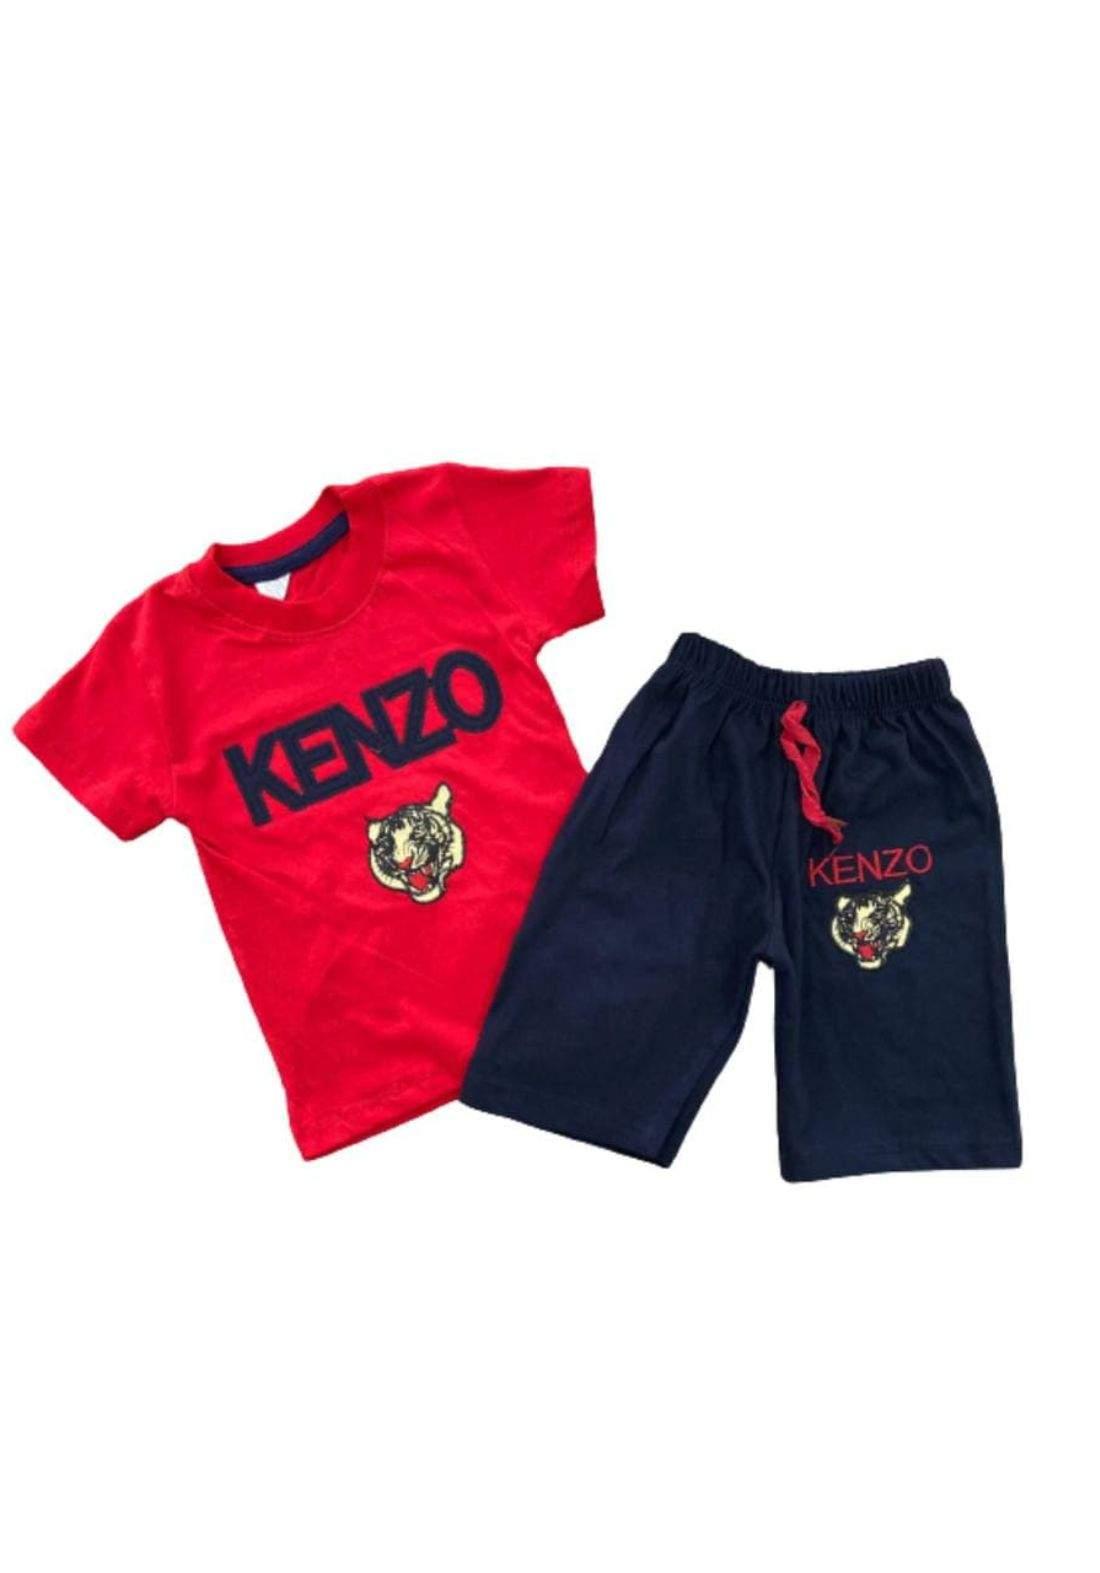 tracksuit for boys  red  (t-shirt+short) تراكسوت ولادي احمر  (شورت و تيشيرت)